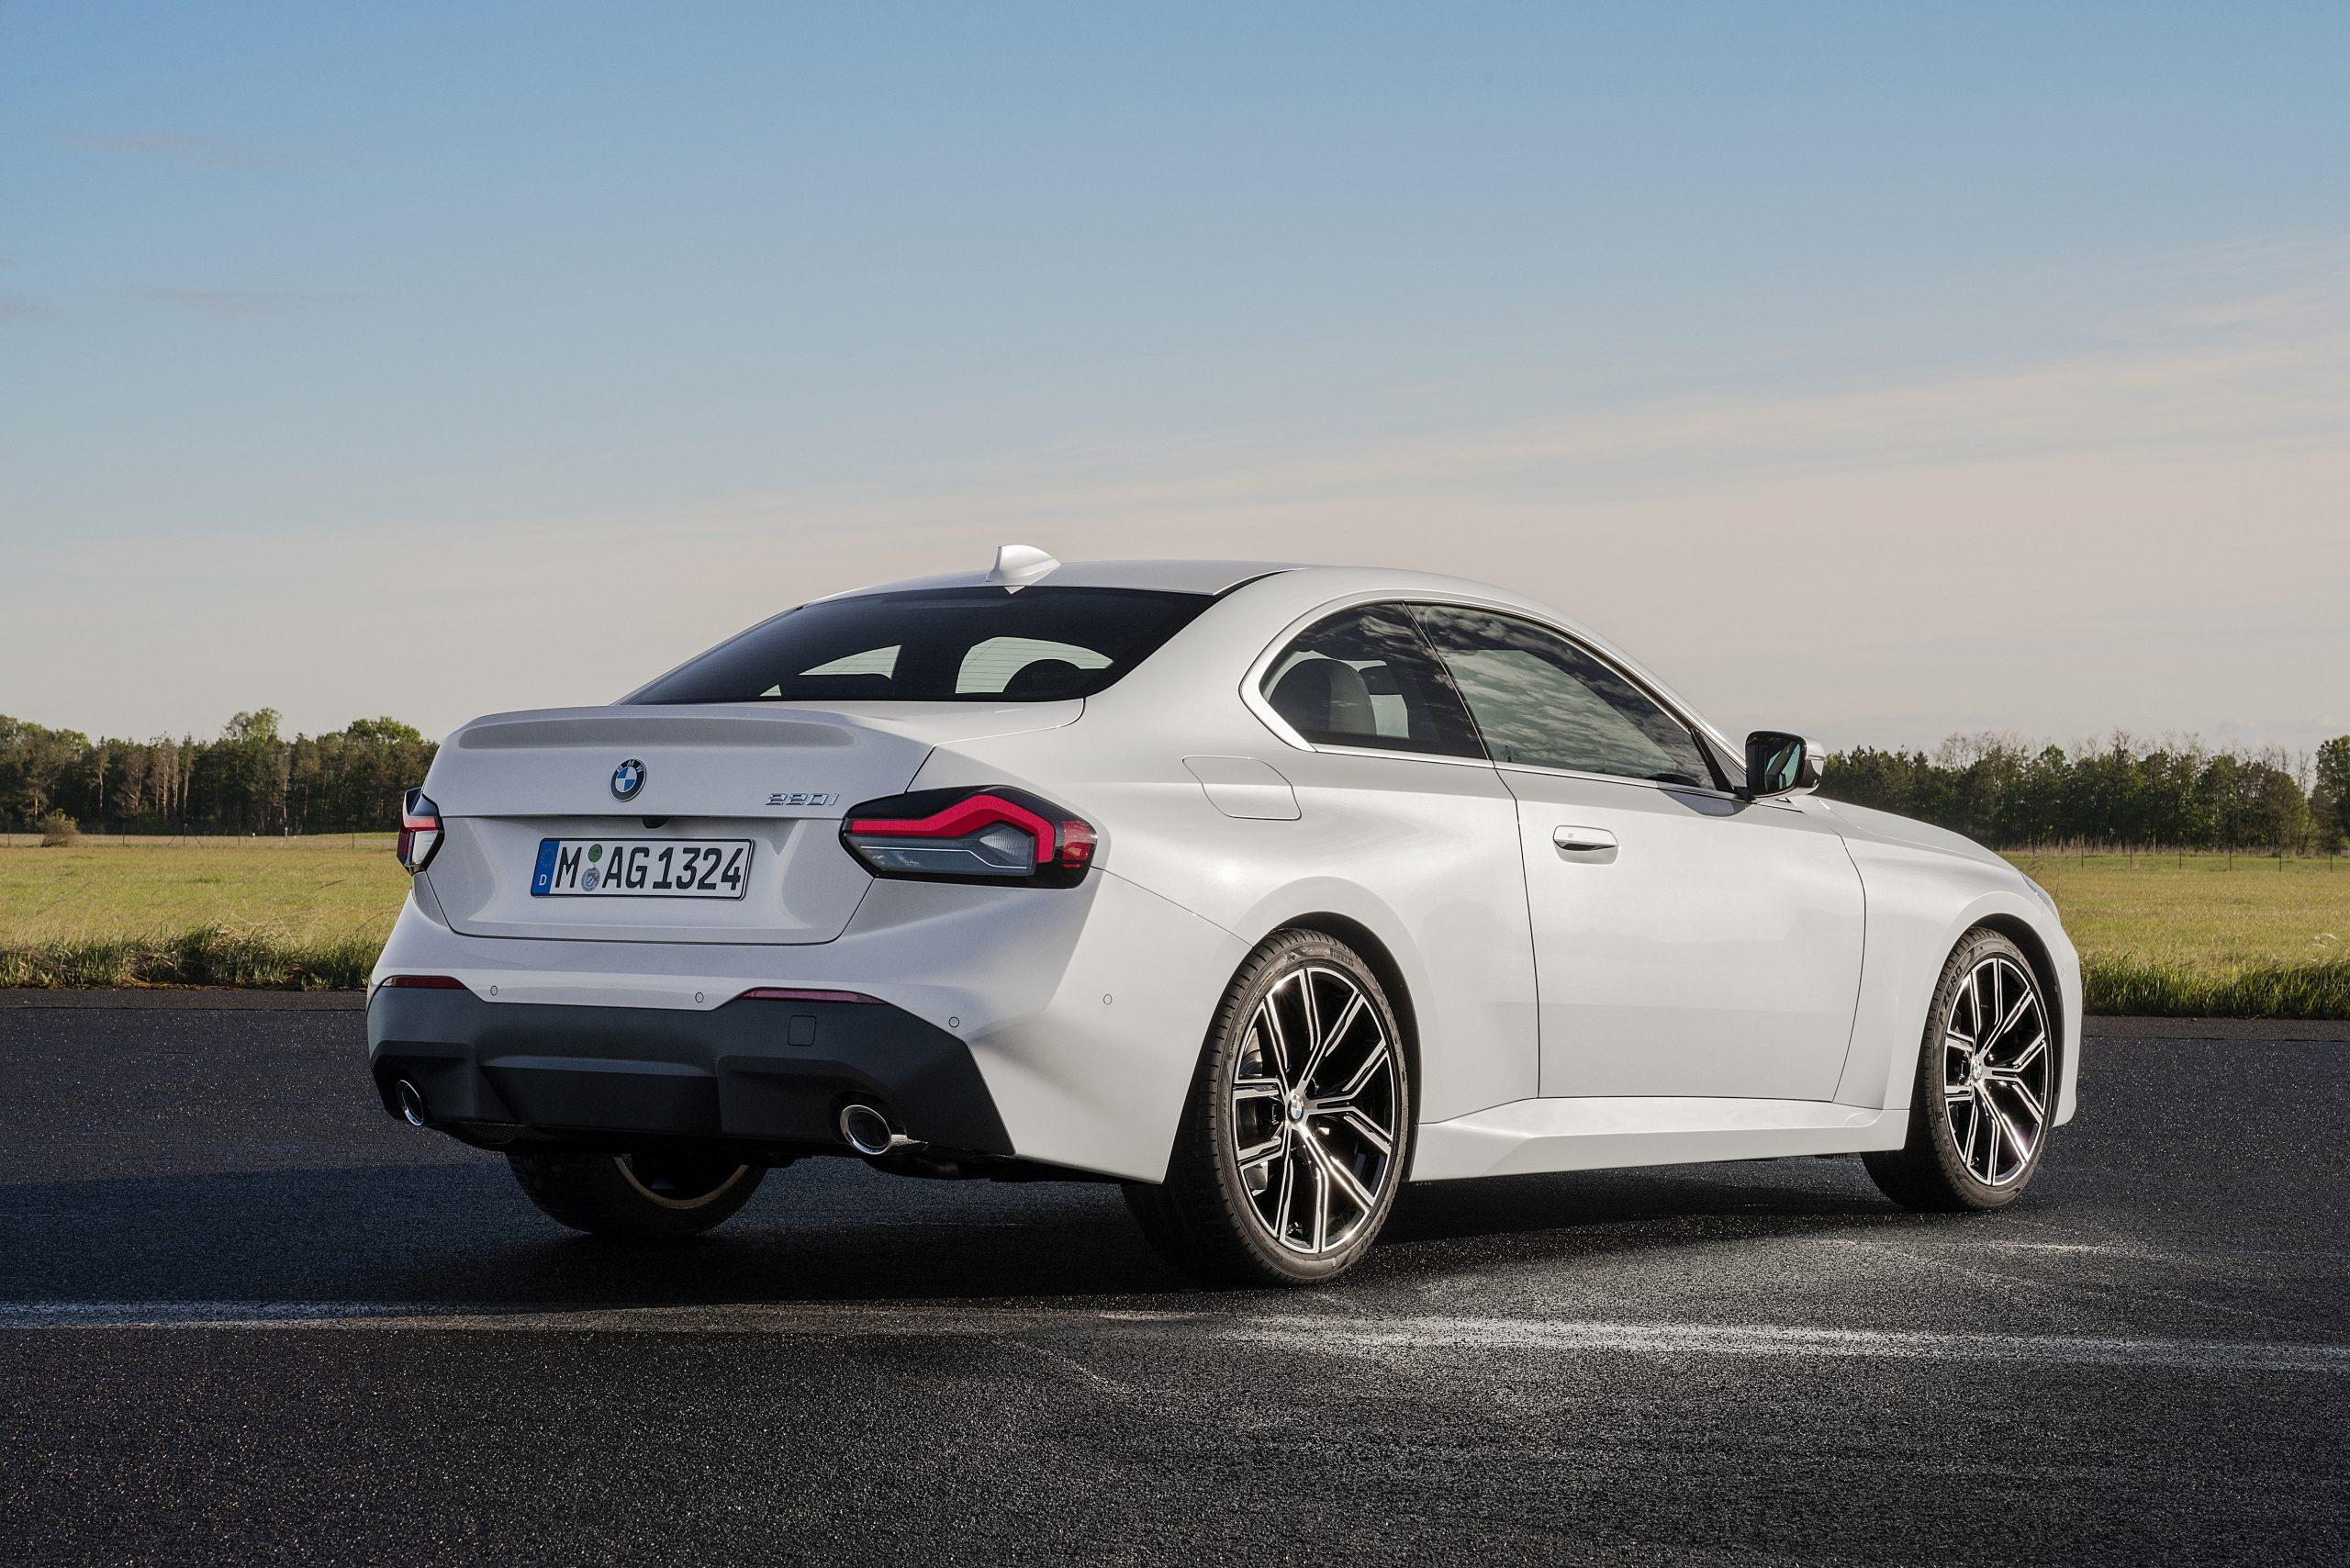 P90428422 highRes scaled Αυτή είναι η νέα BMW Σειρά 2 Coupe BMW, Bmw 2, BMW Σειρά 2, zblog, ειδήσεις, Νέα, Σειρά 2